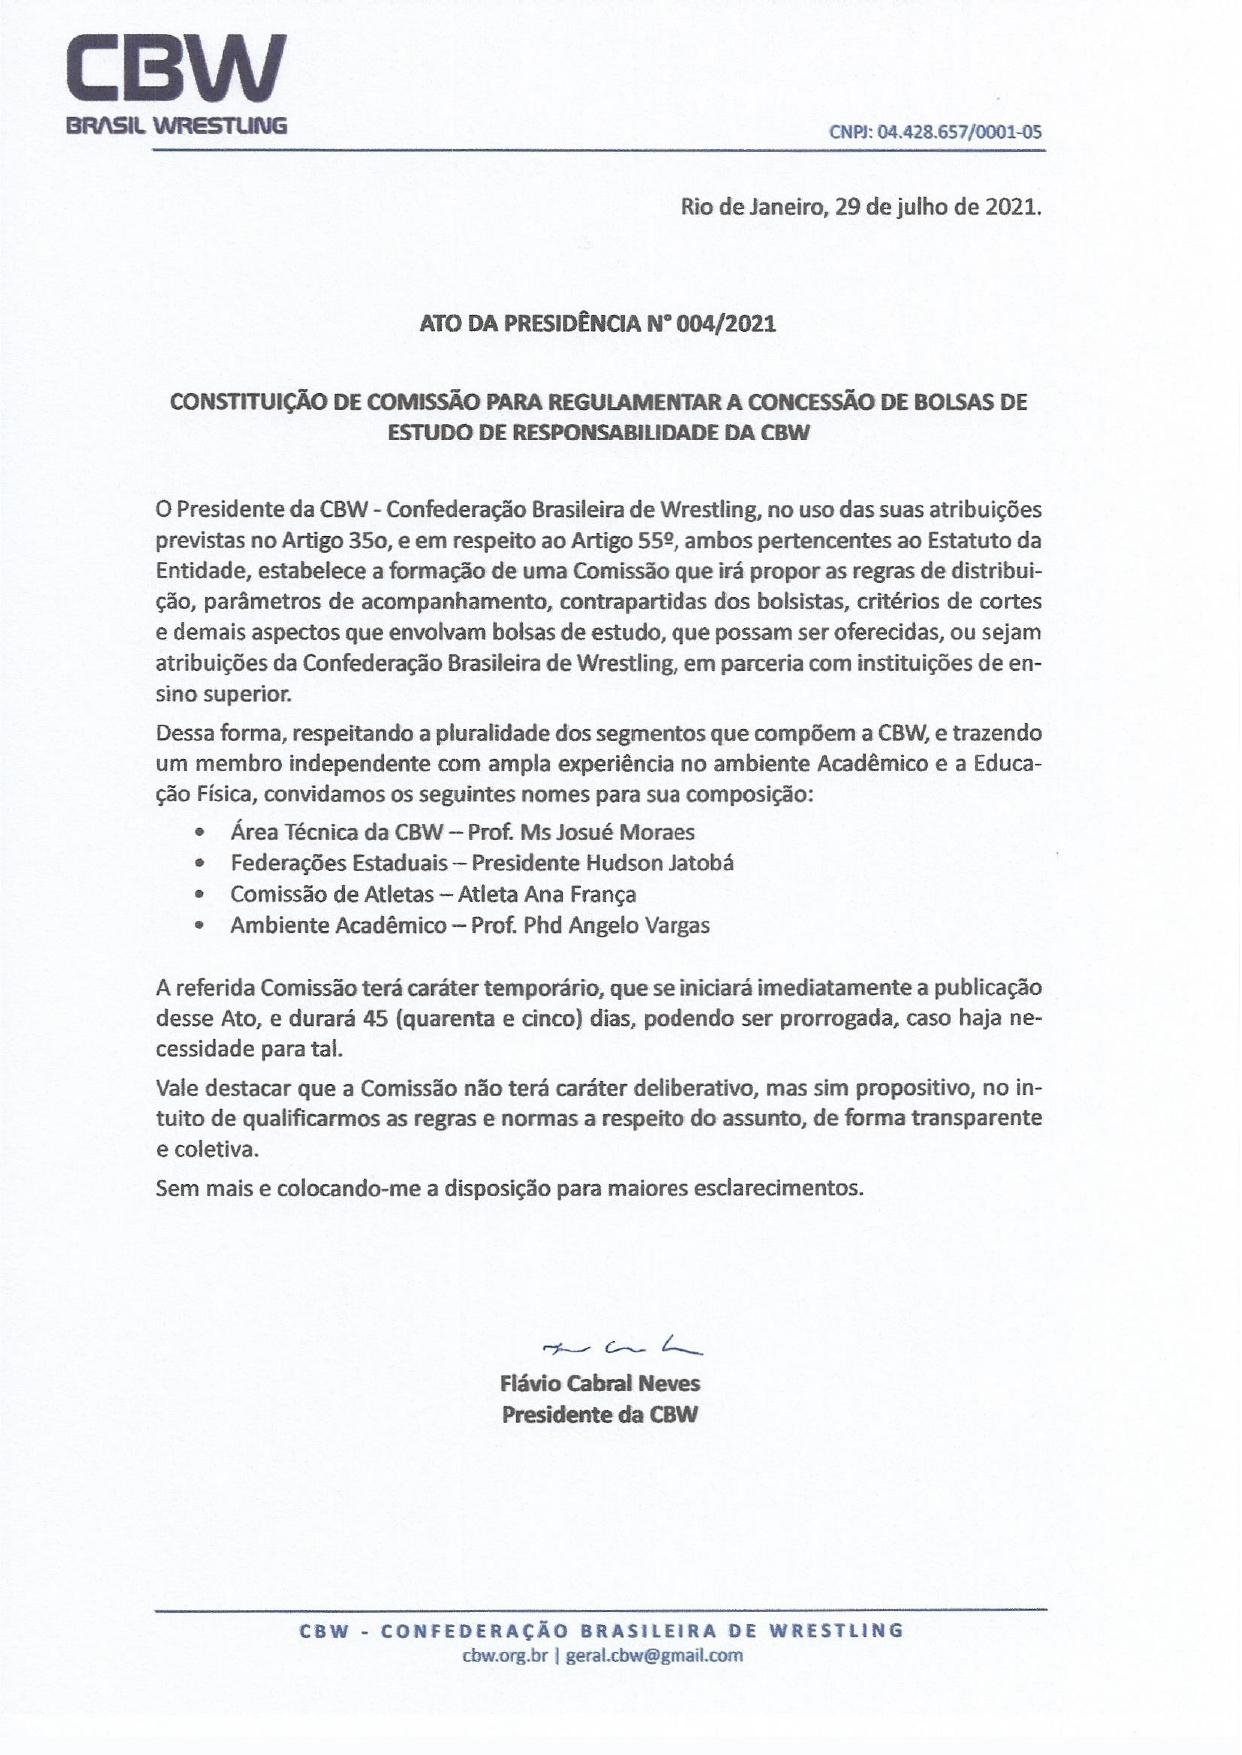 ATO PRESIDENCIAL 04.2021_page-0001